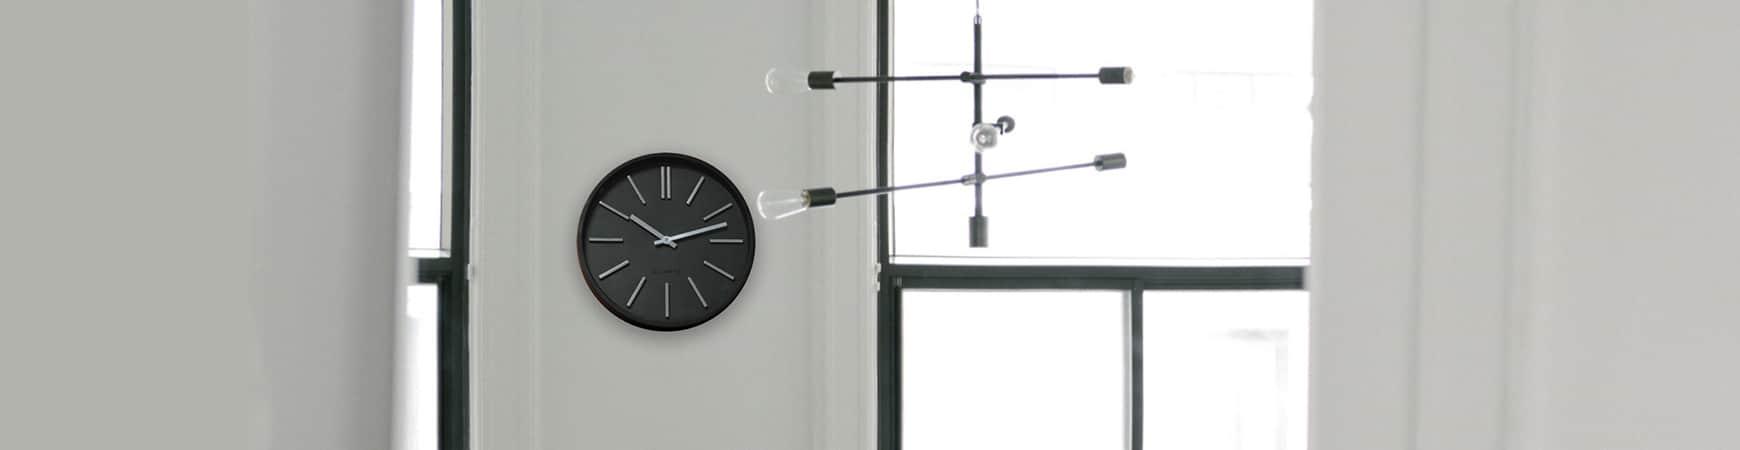 Horloge flip flap Pendulum